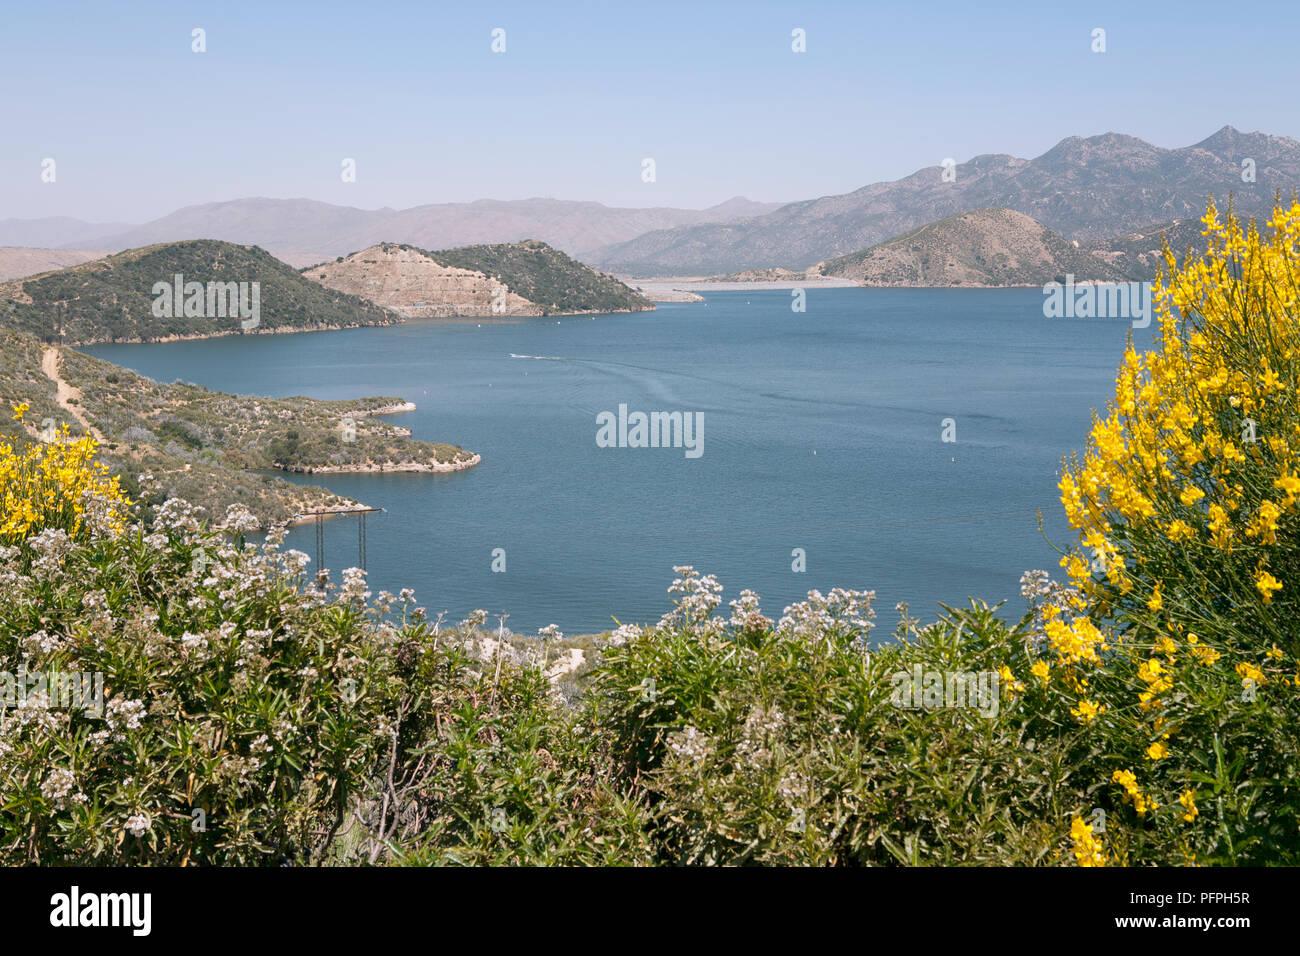 USA, California, San Bernardino County, Silverwood Lake